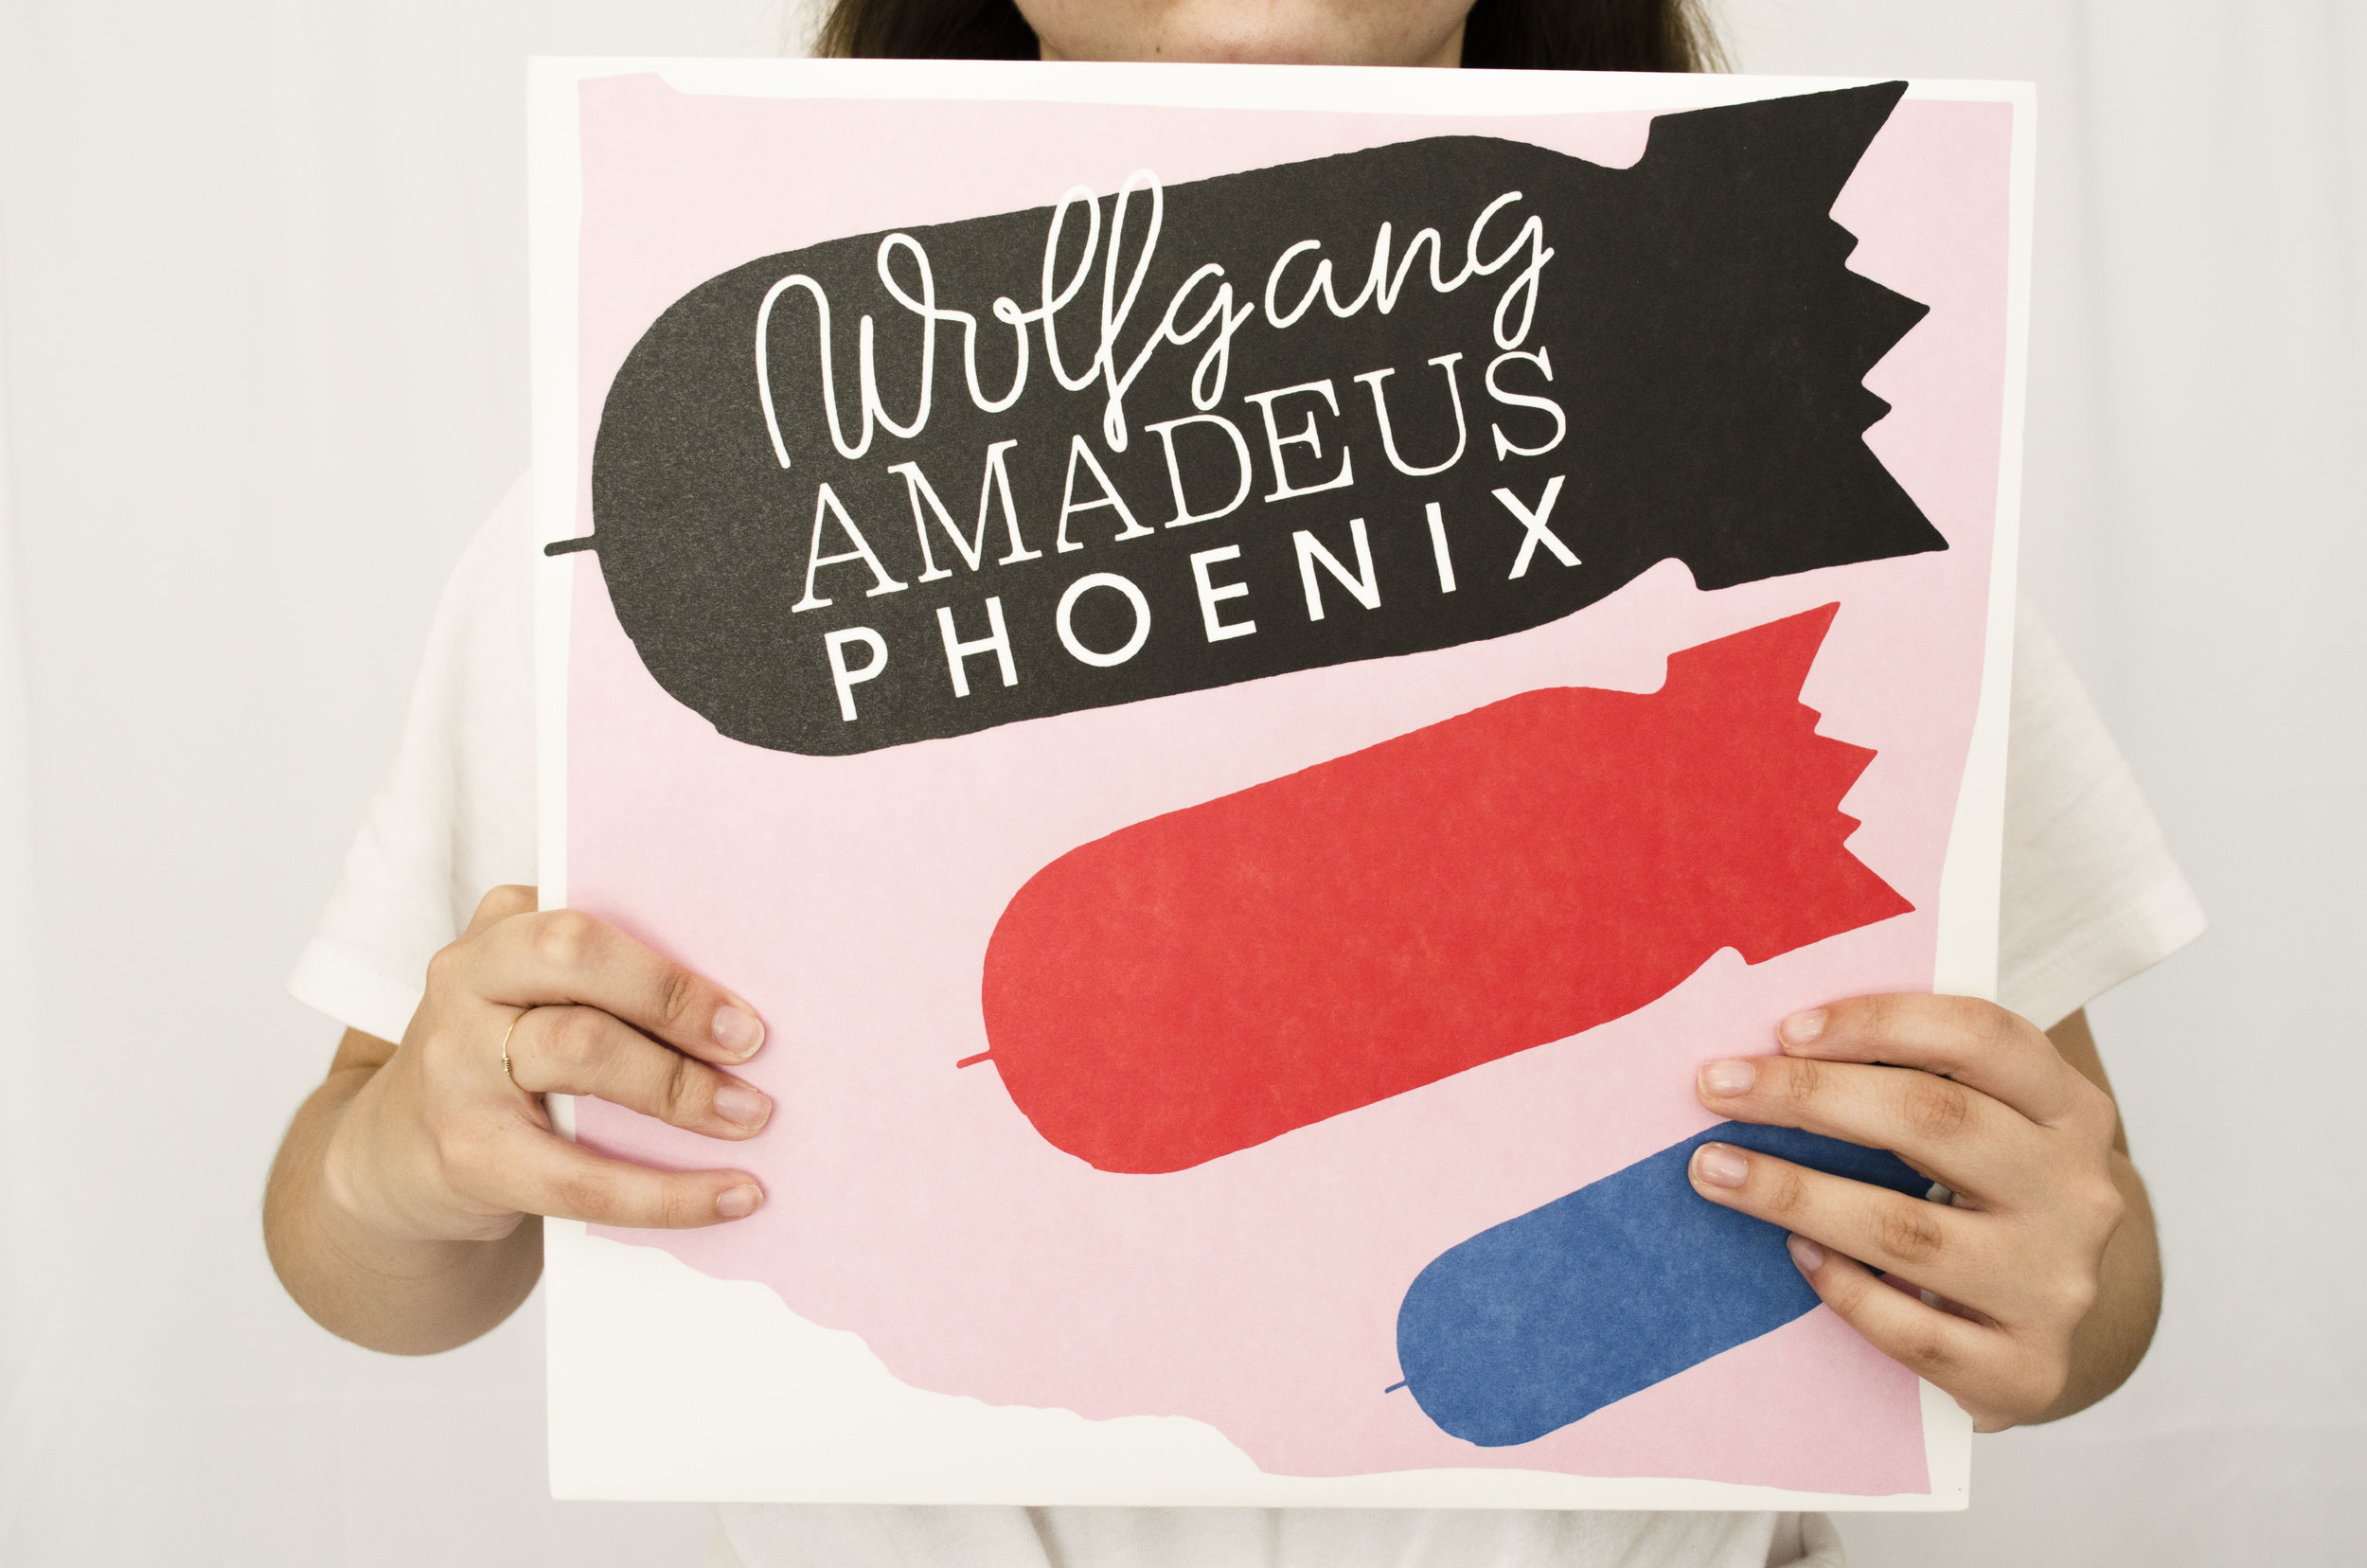 Wolfgang Amadeus - by Phoenix